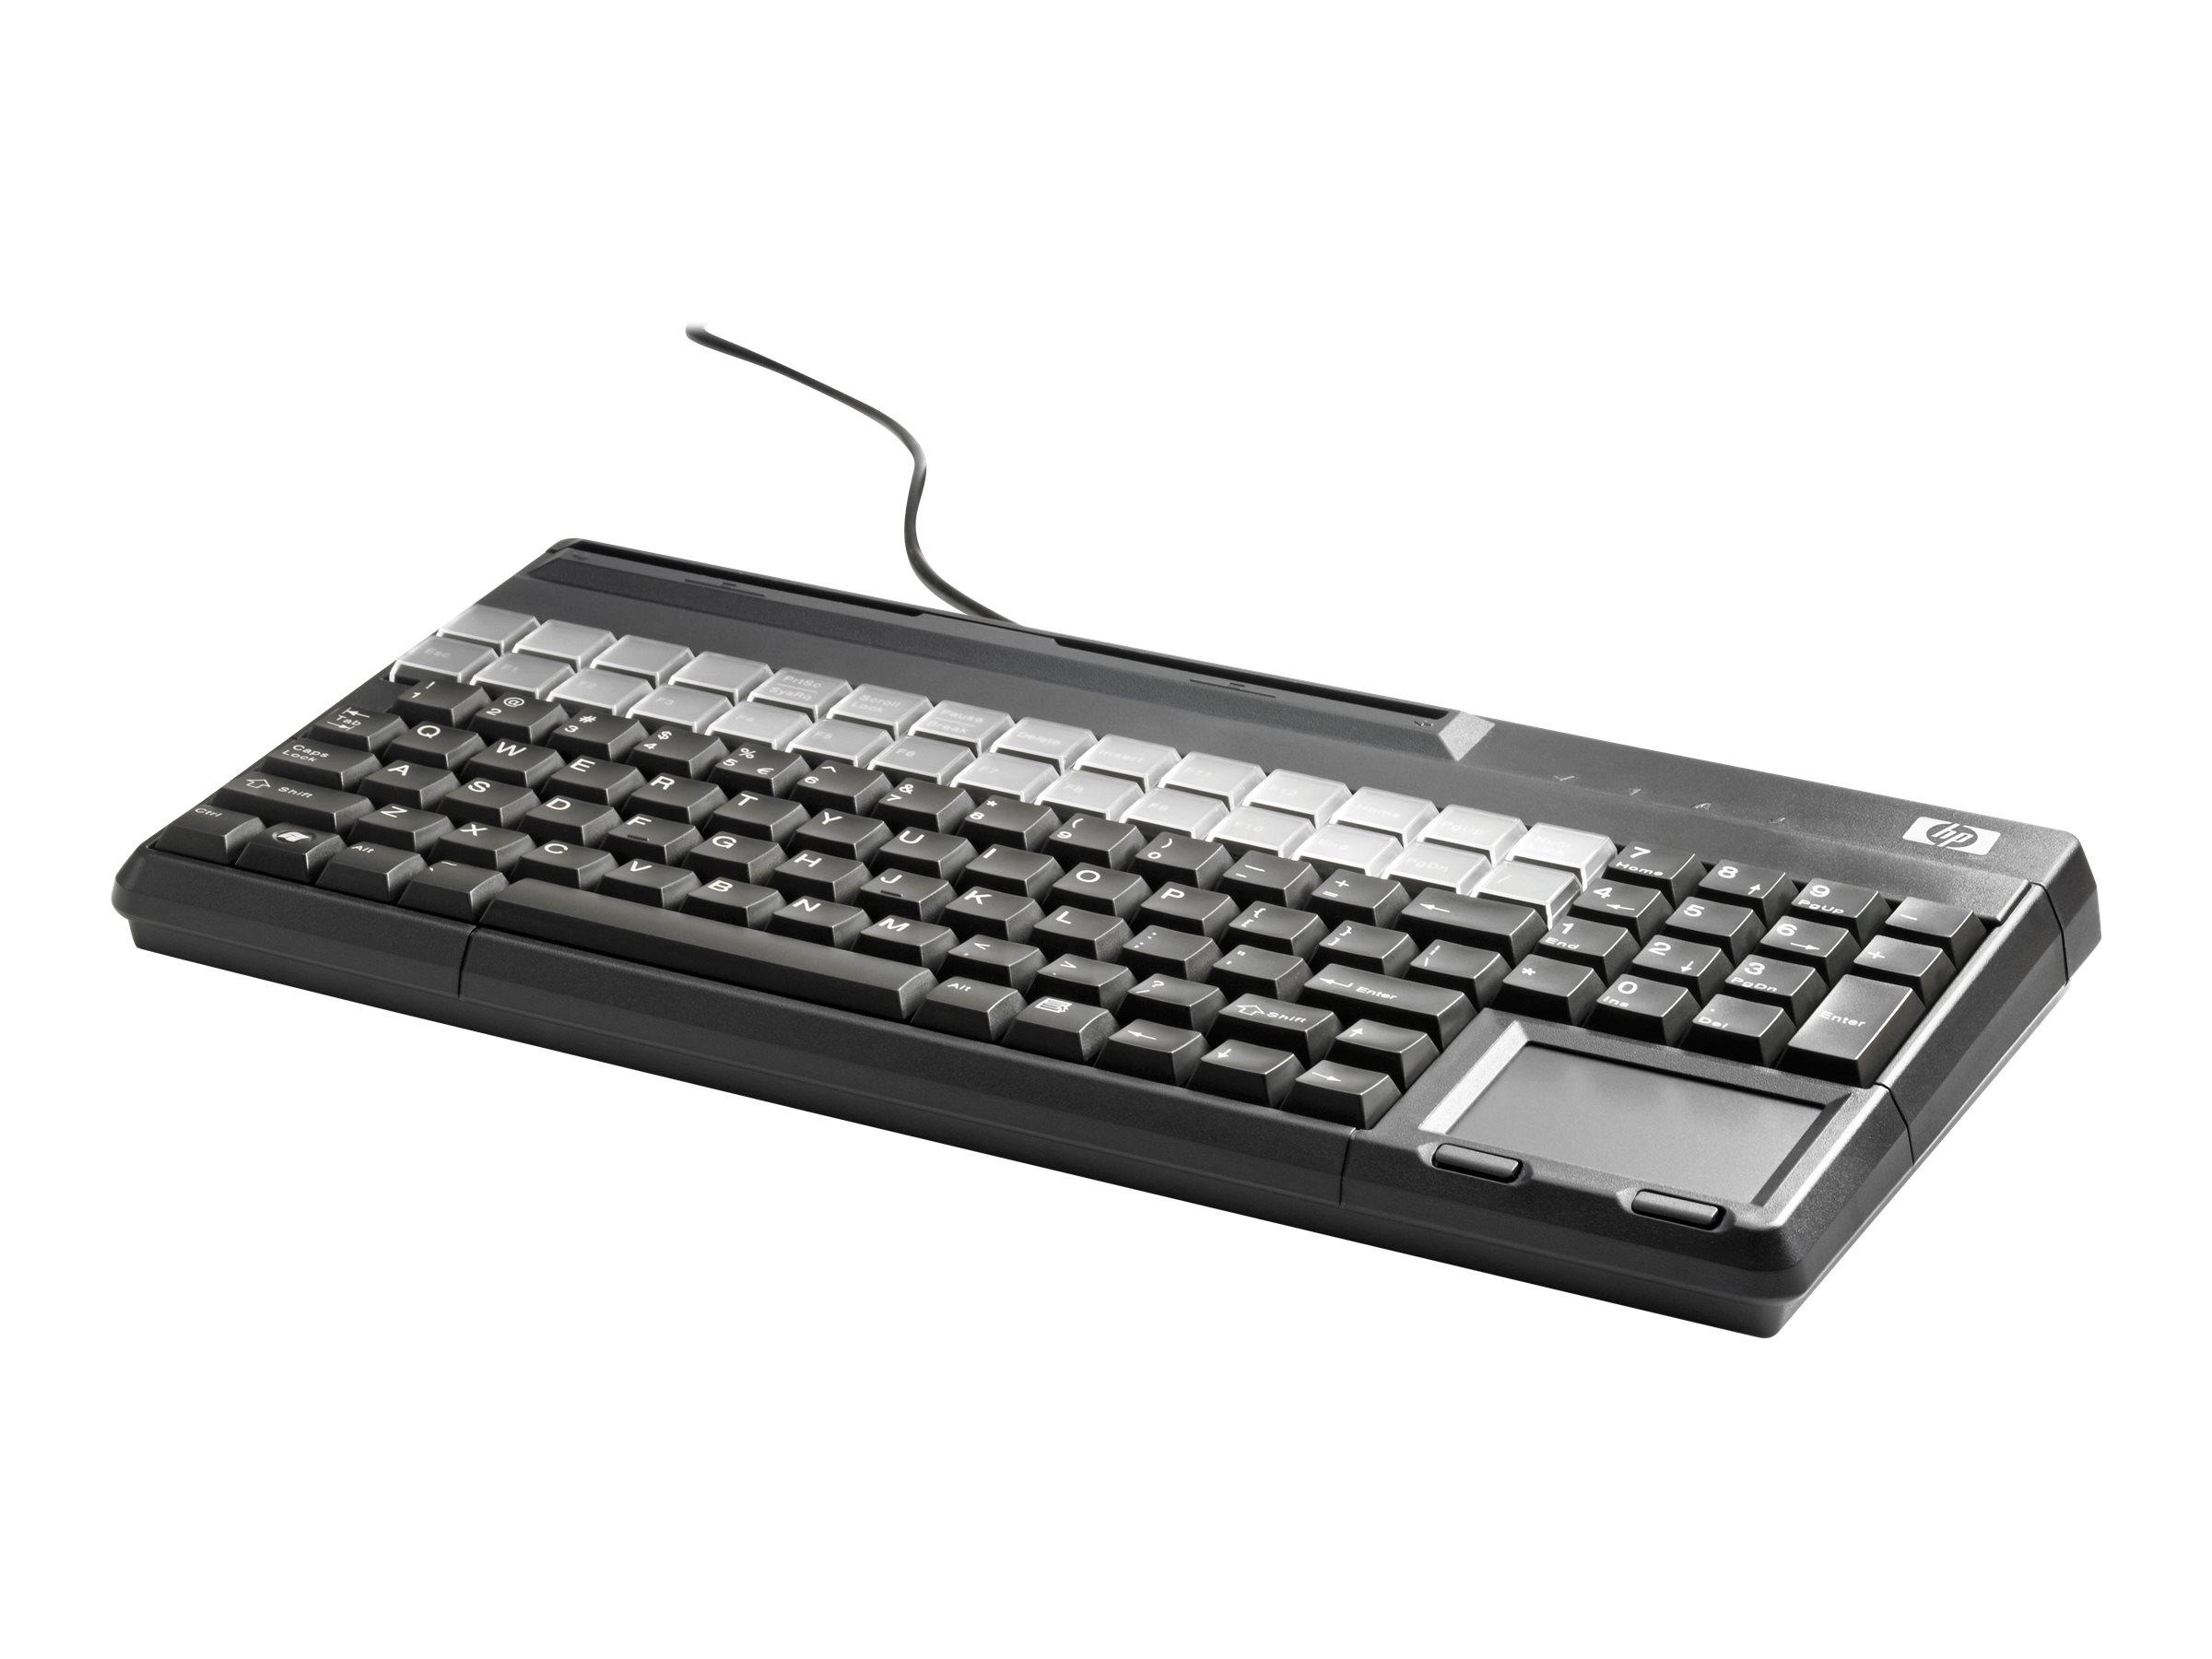 HP POS Keyboard with Magnetic Stripe Reader - Tastatur - USB - Carbonite - für ElitePOS G1 Retail System; Engage One; MX12; RP3